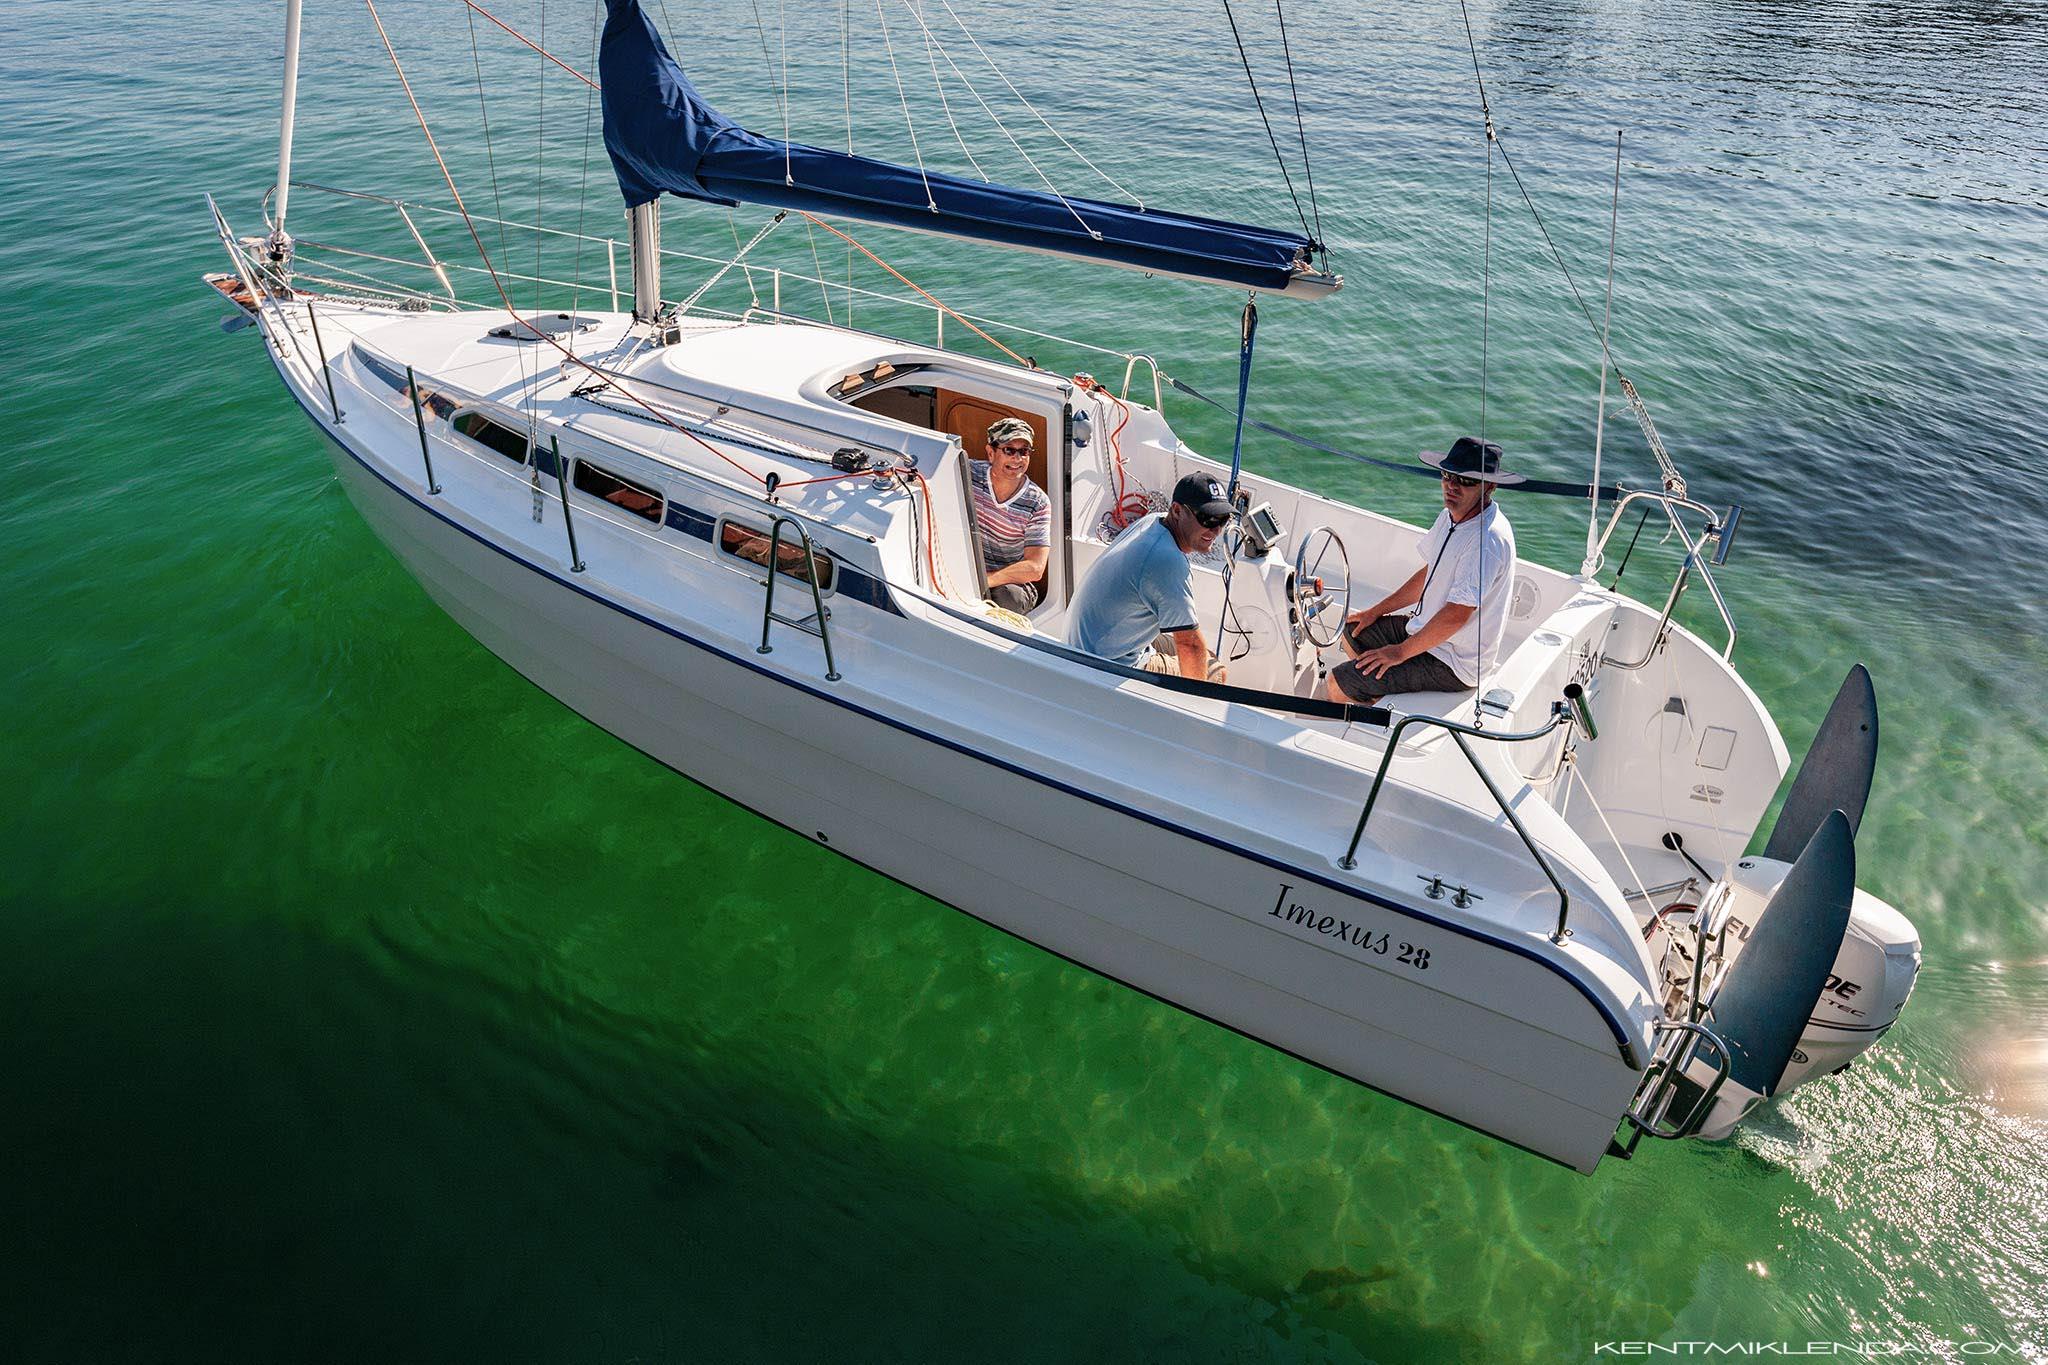 Imexus-28-passing-Manly-Wharf-2048x1365-KM.jpg